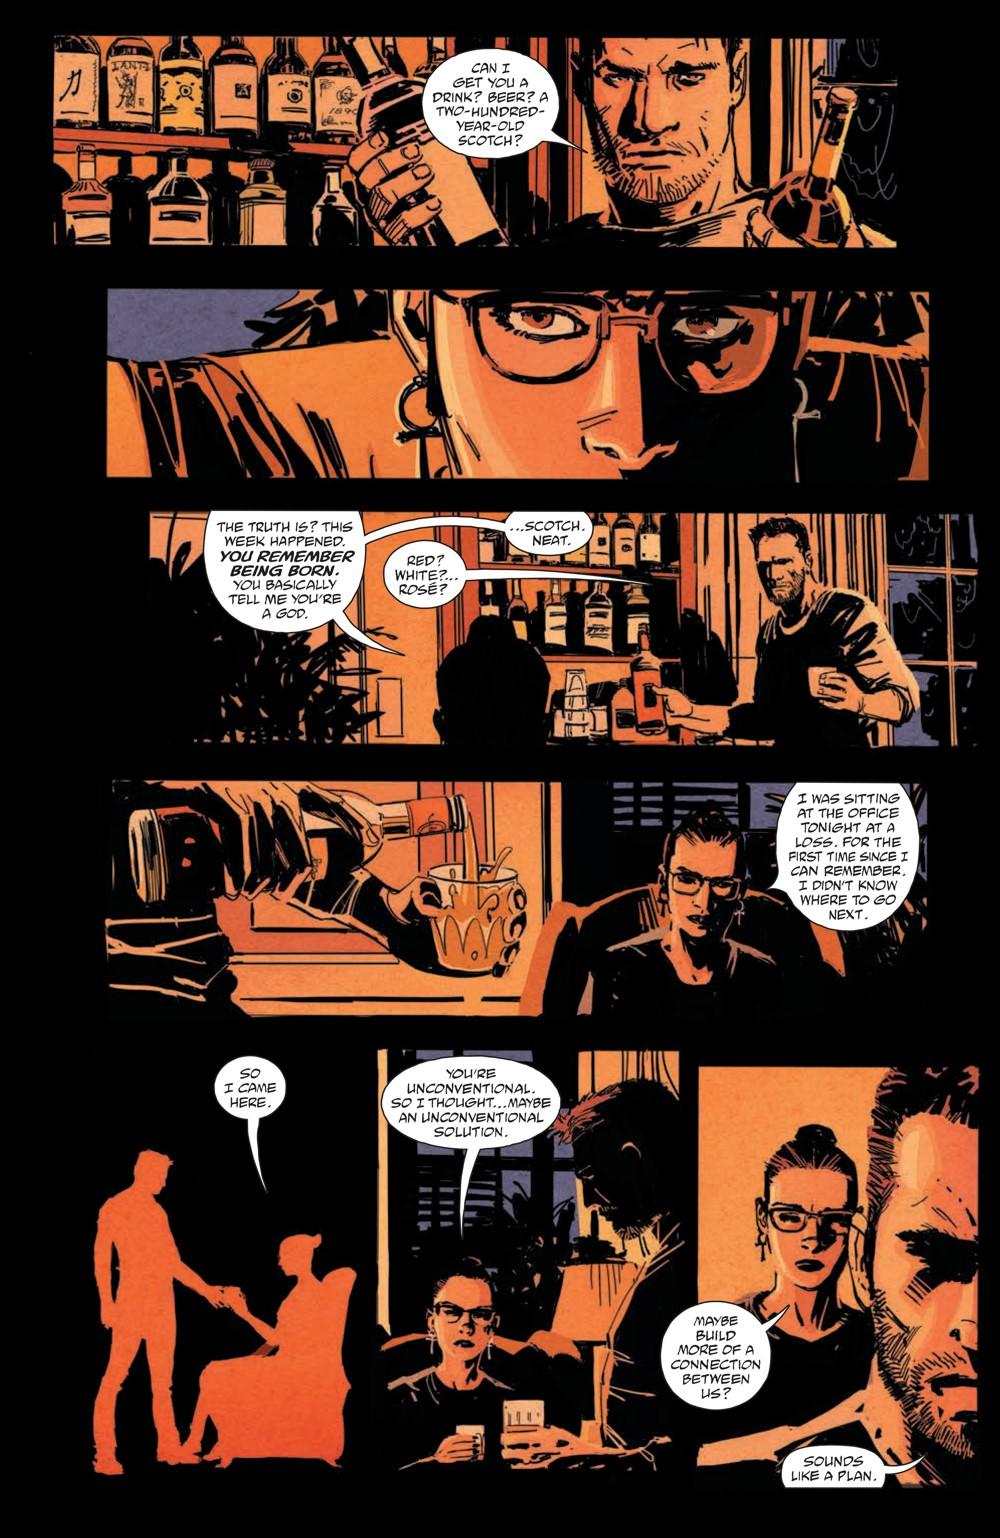 BRZRKR_005_PRESS_5 ComicList Previews: BRZRKR #5 (Of 12)